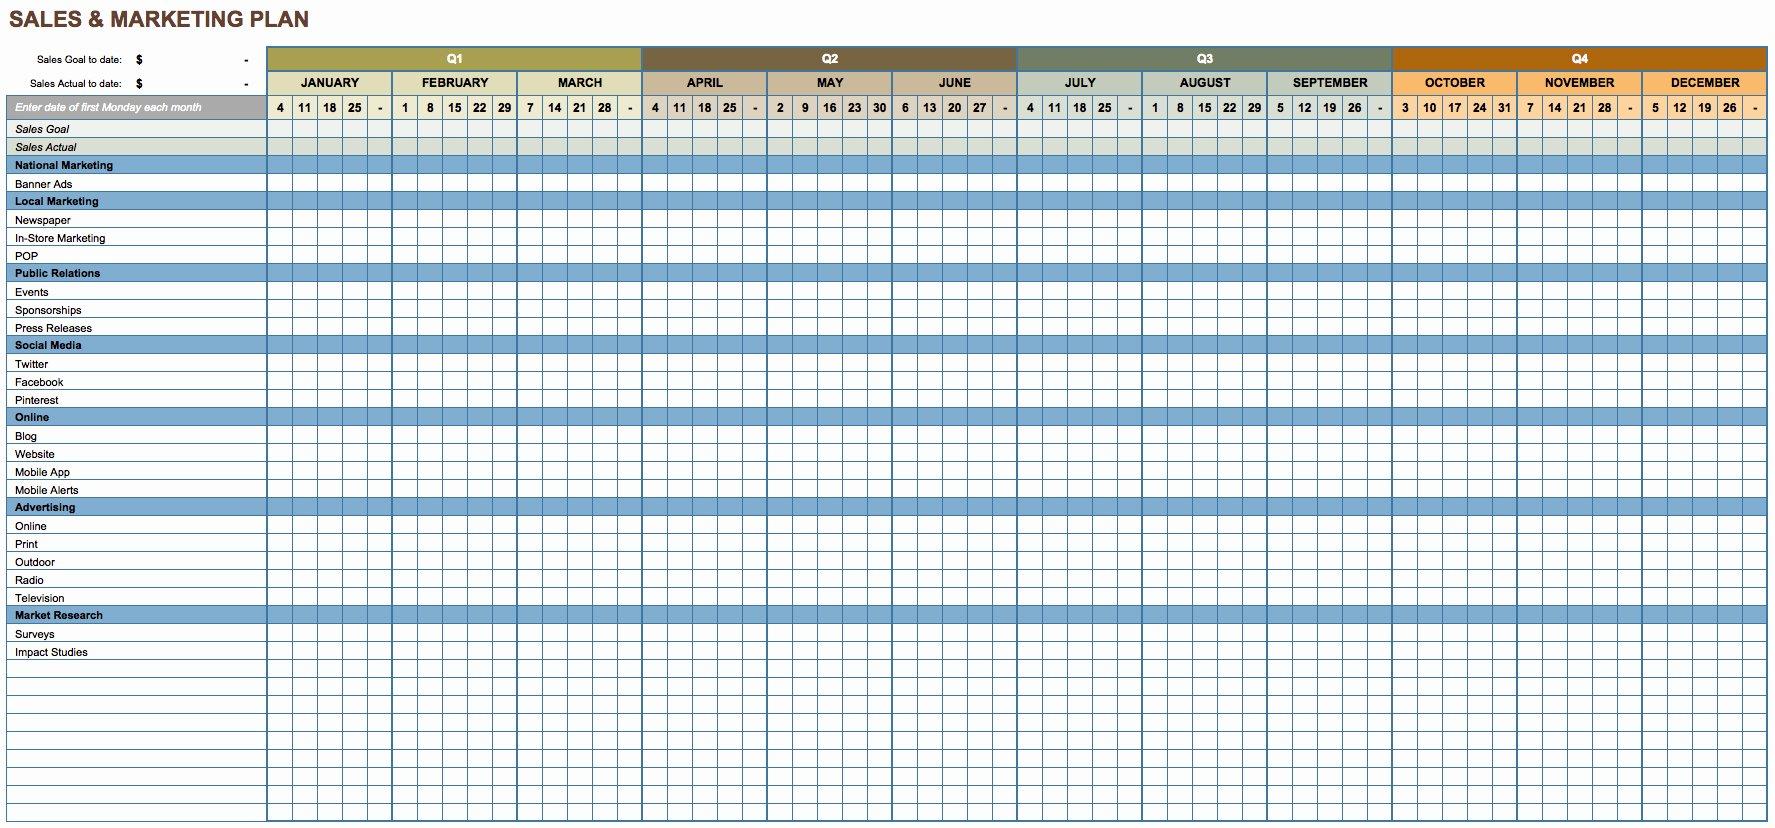 Strategic Plan Template Excel New Free Marketing Plan Templates for Excel Smartsheet